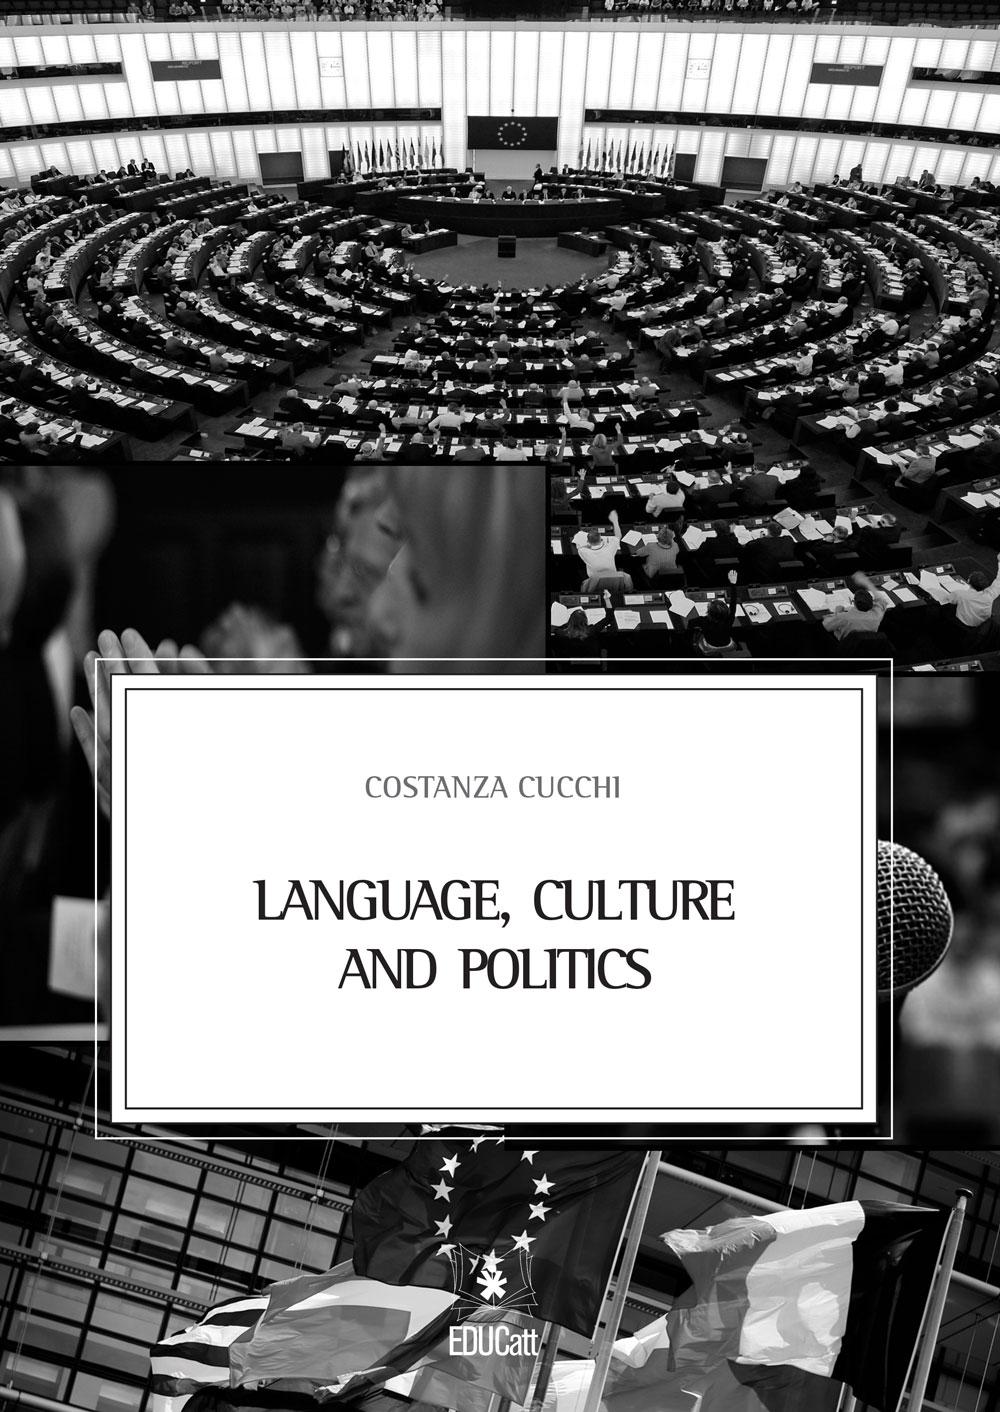 LANGUAGE CULTURE AND POLITICS